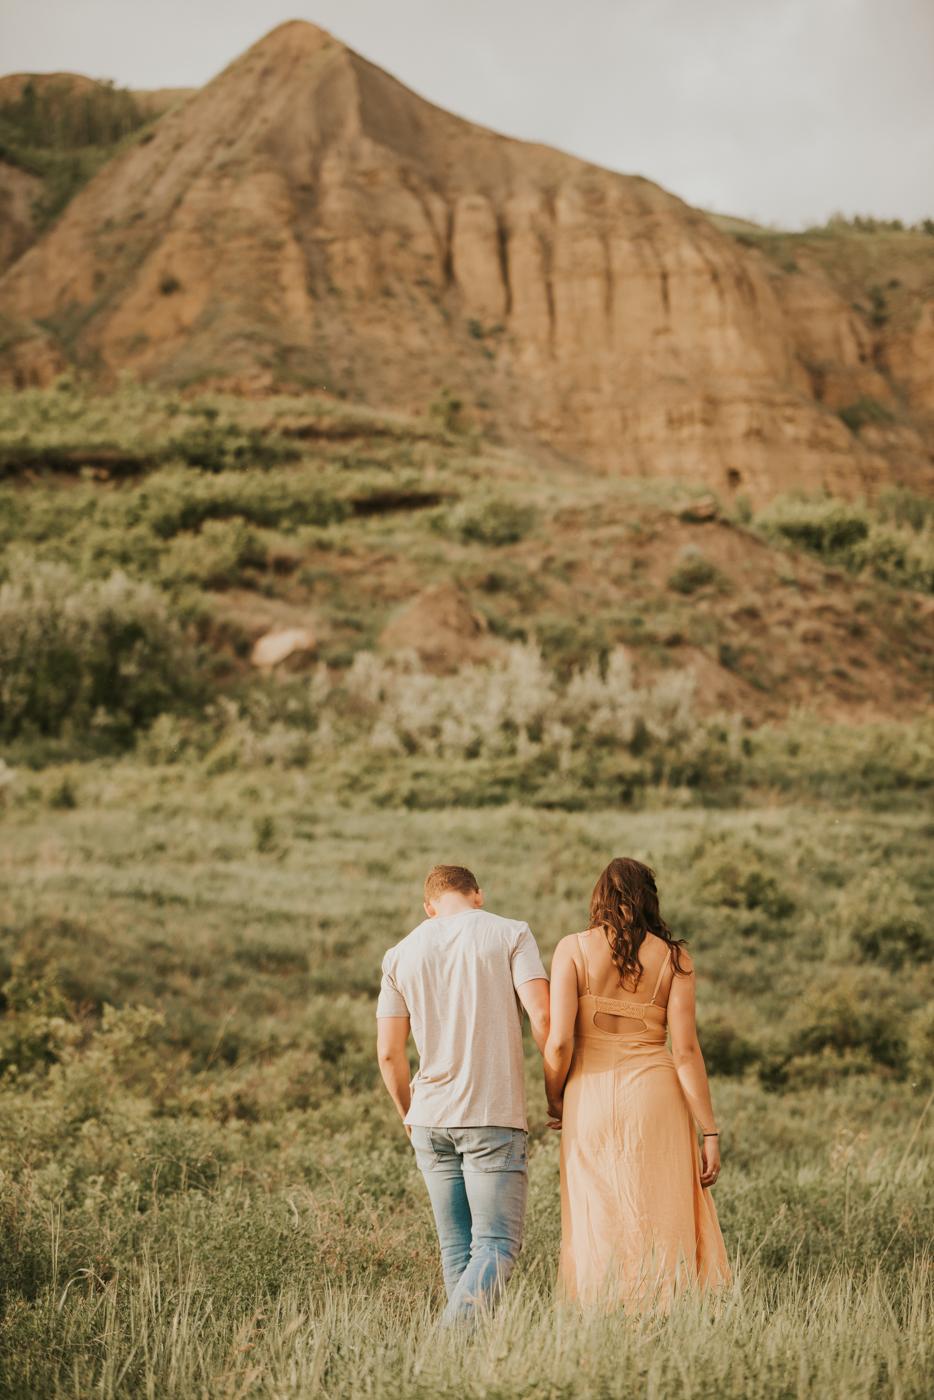 tyraephotography_photographer_wedding_elopement_engagement_photography-2-11.jpg